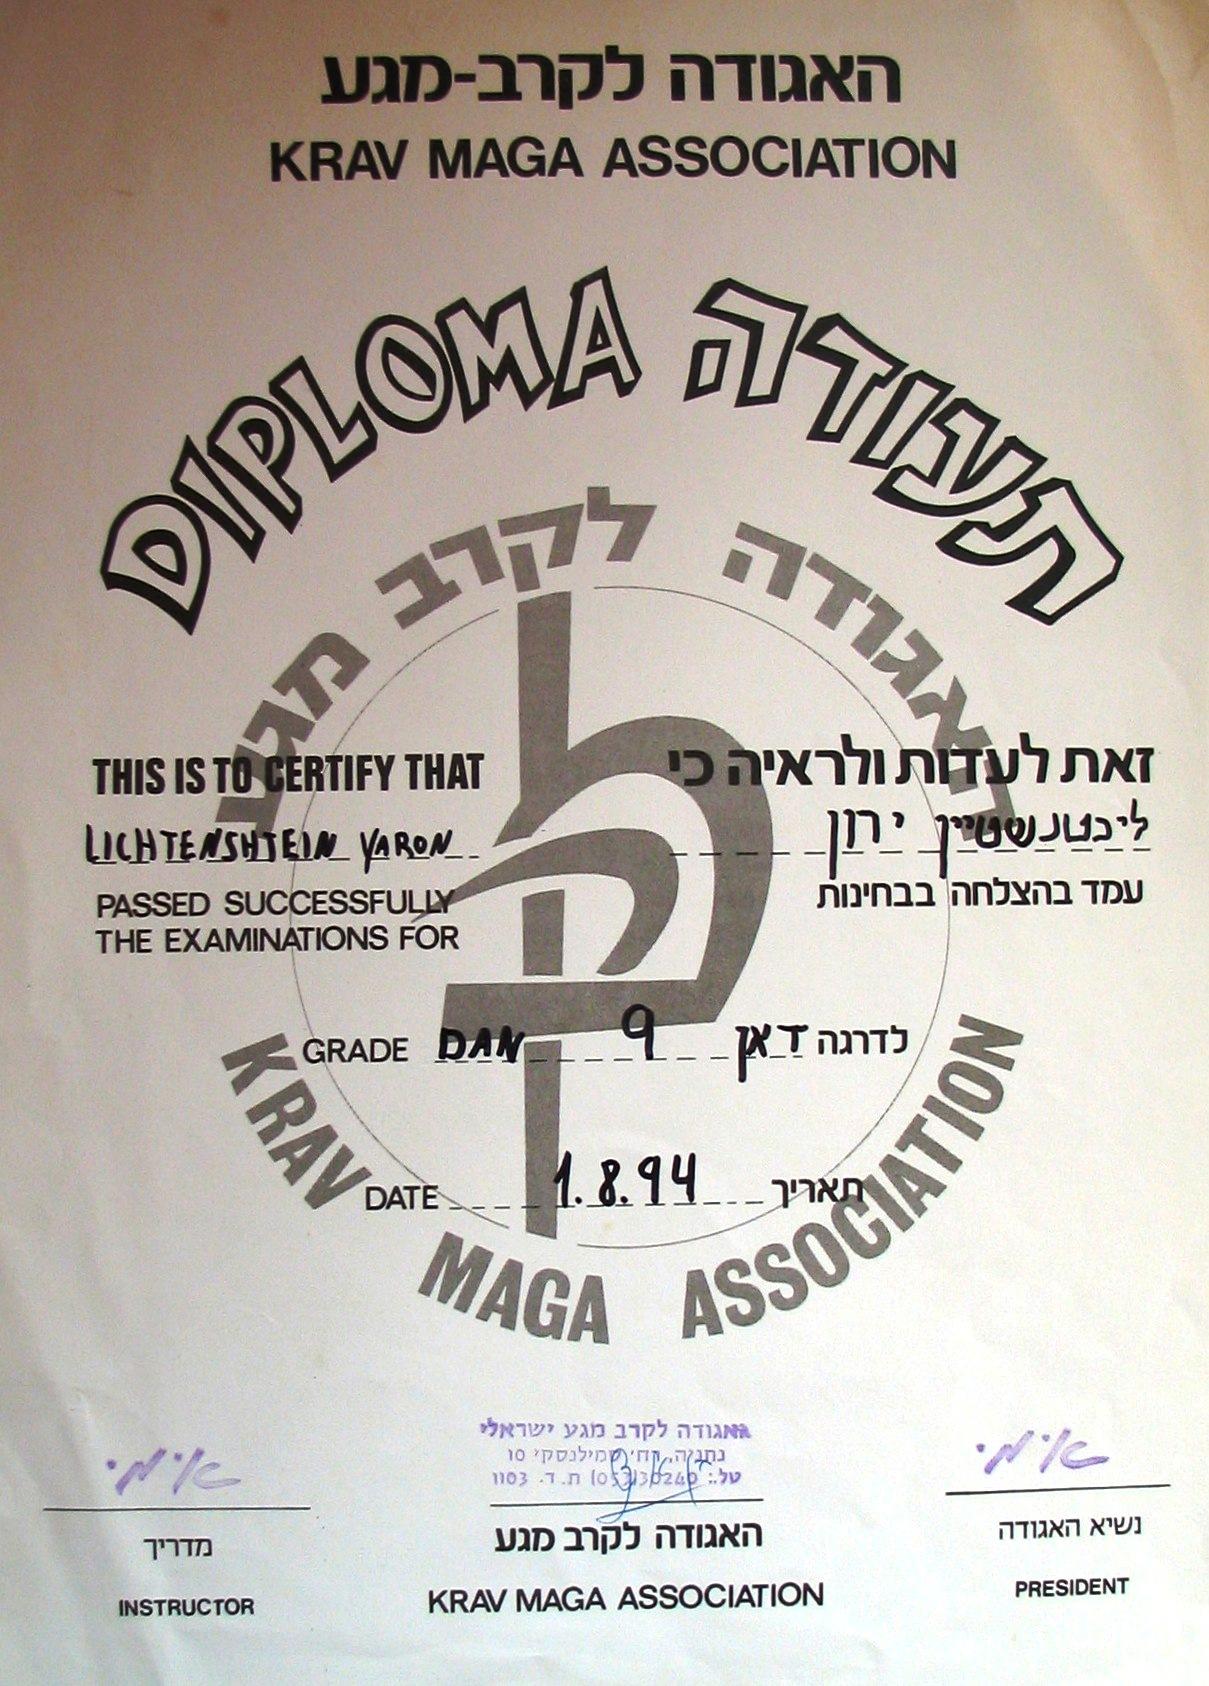 file krav maga diploma dan yaron lichtenstein jpg  file krav maga diploma 9 dan yaron lichtenstein jpg